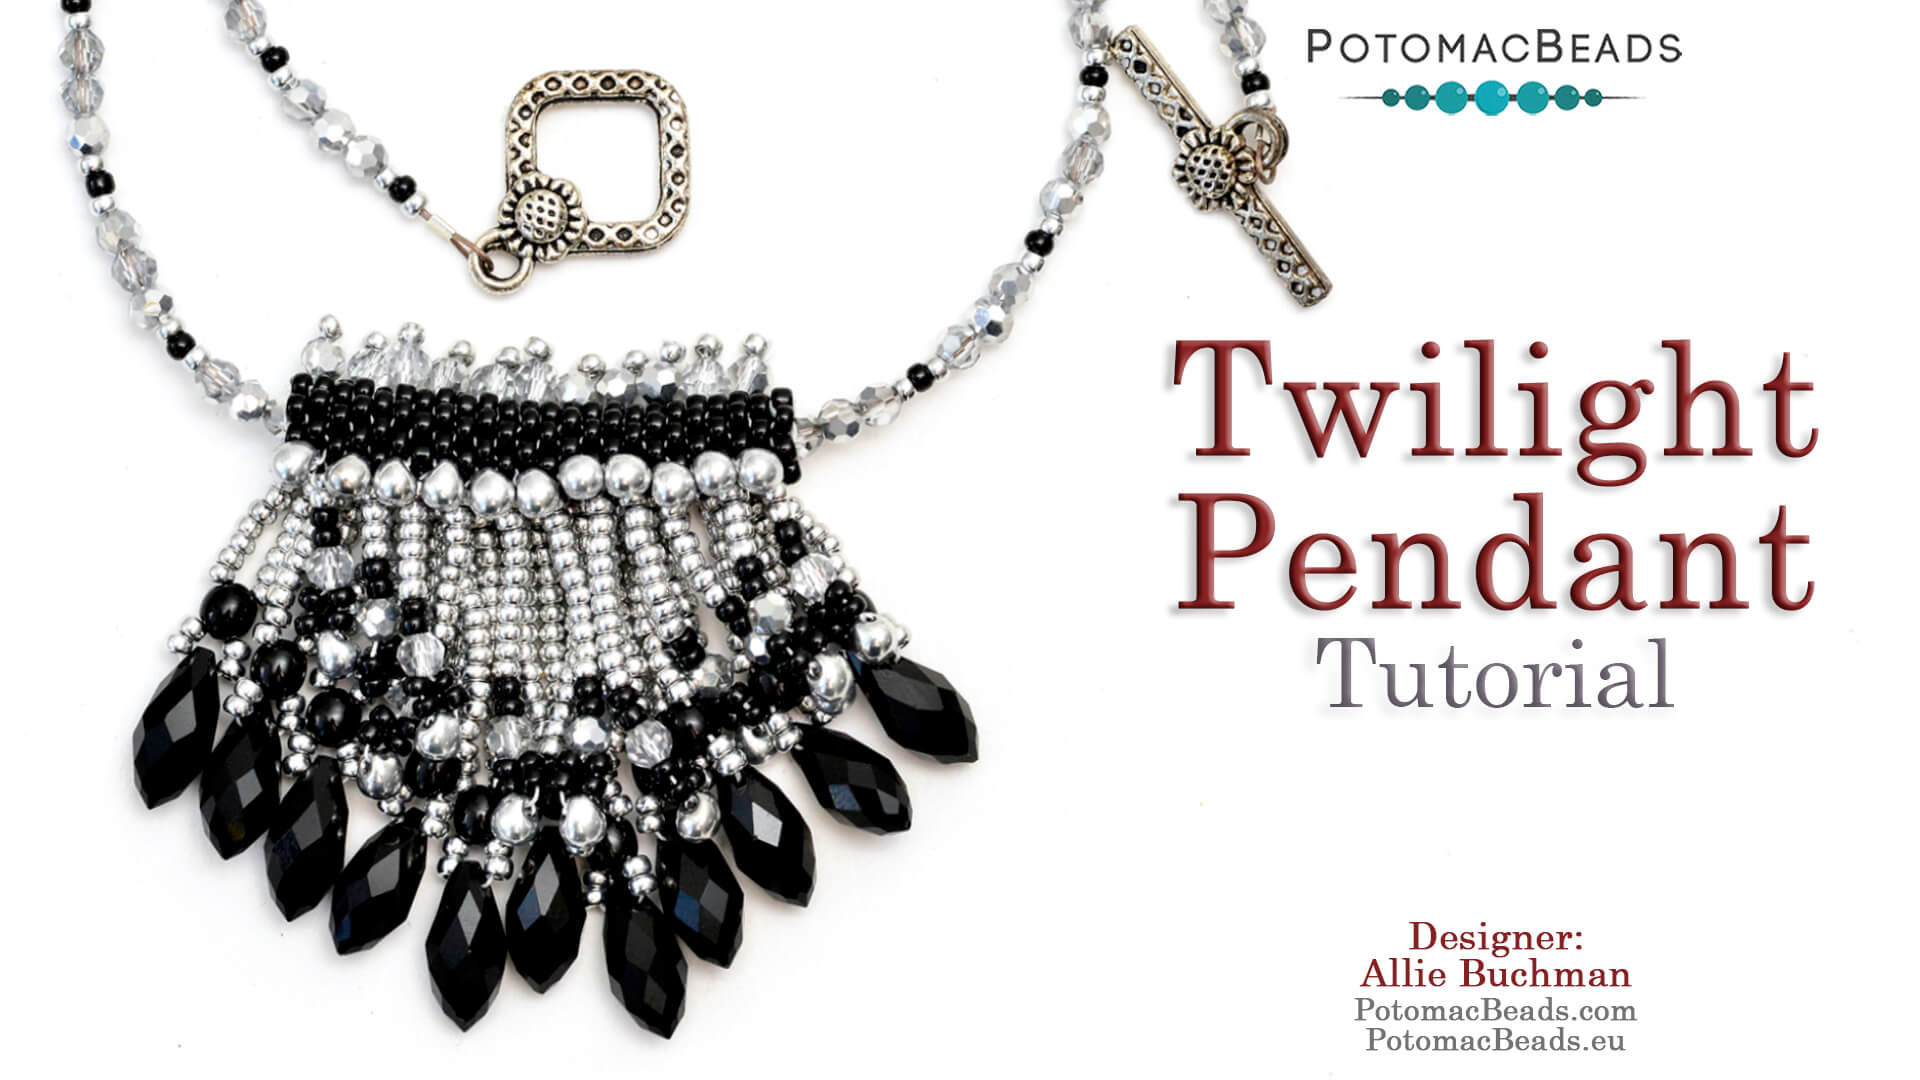 How to Bead Jewelry / Videos Sorted by Beads / RounDuo® & RounDuo® Mini Bead Videos / Twilight Pendant Tutorial